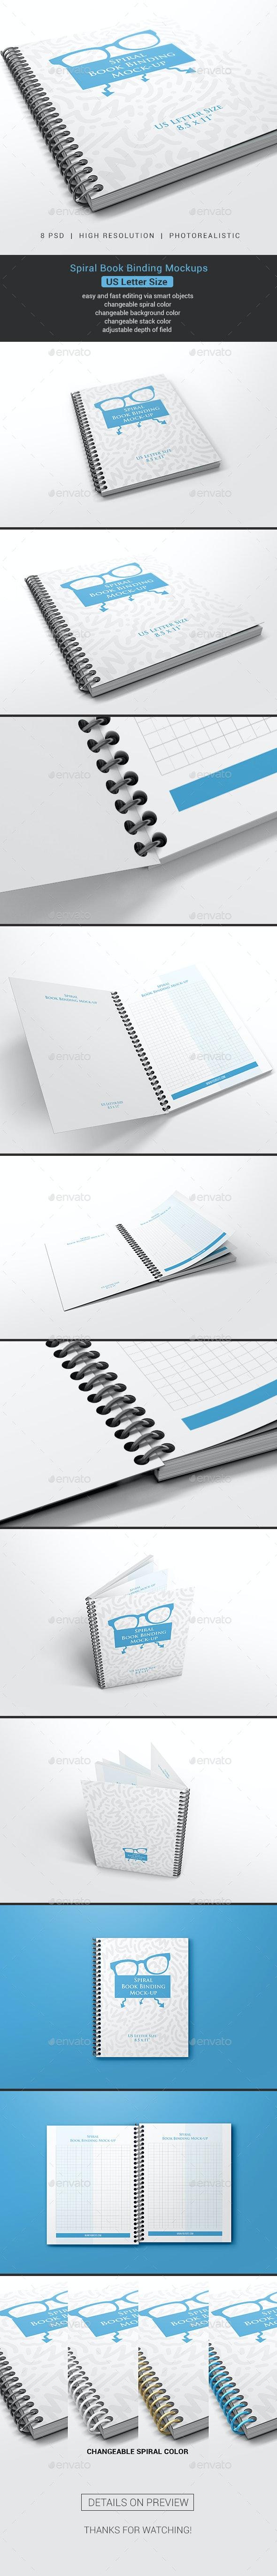 Spiral Book Binding US Letter Size Mockups - Books Print